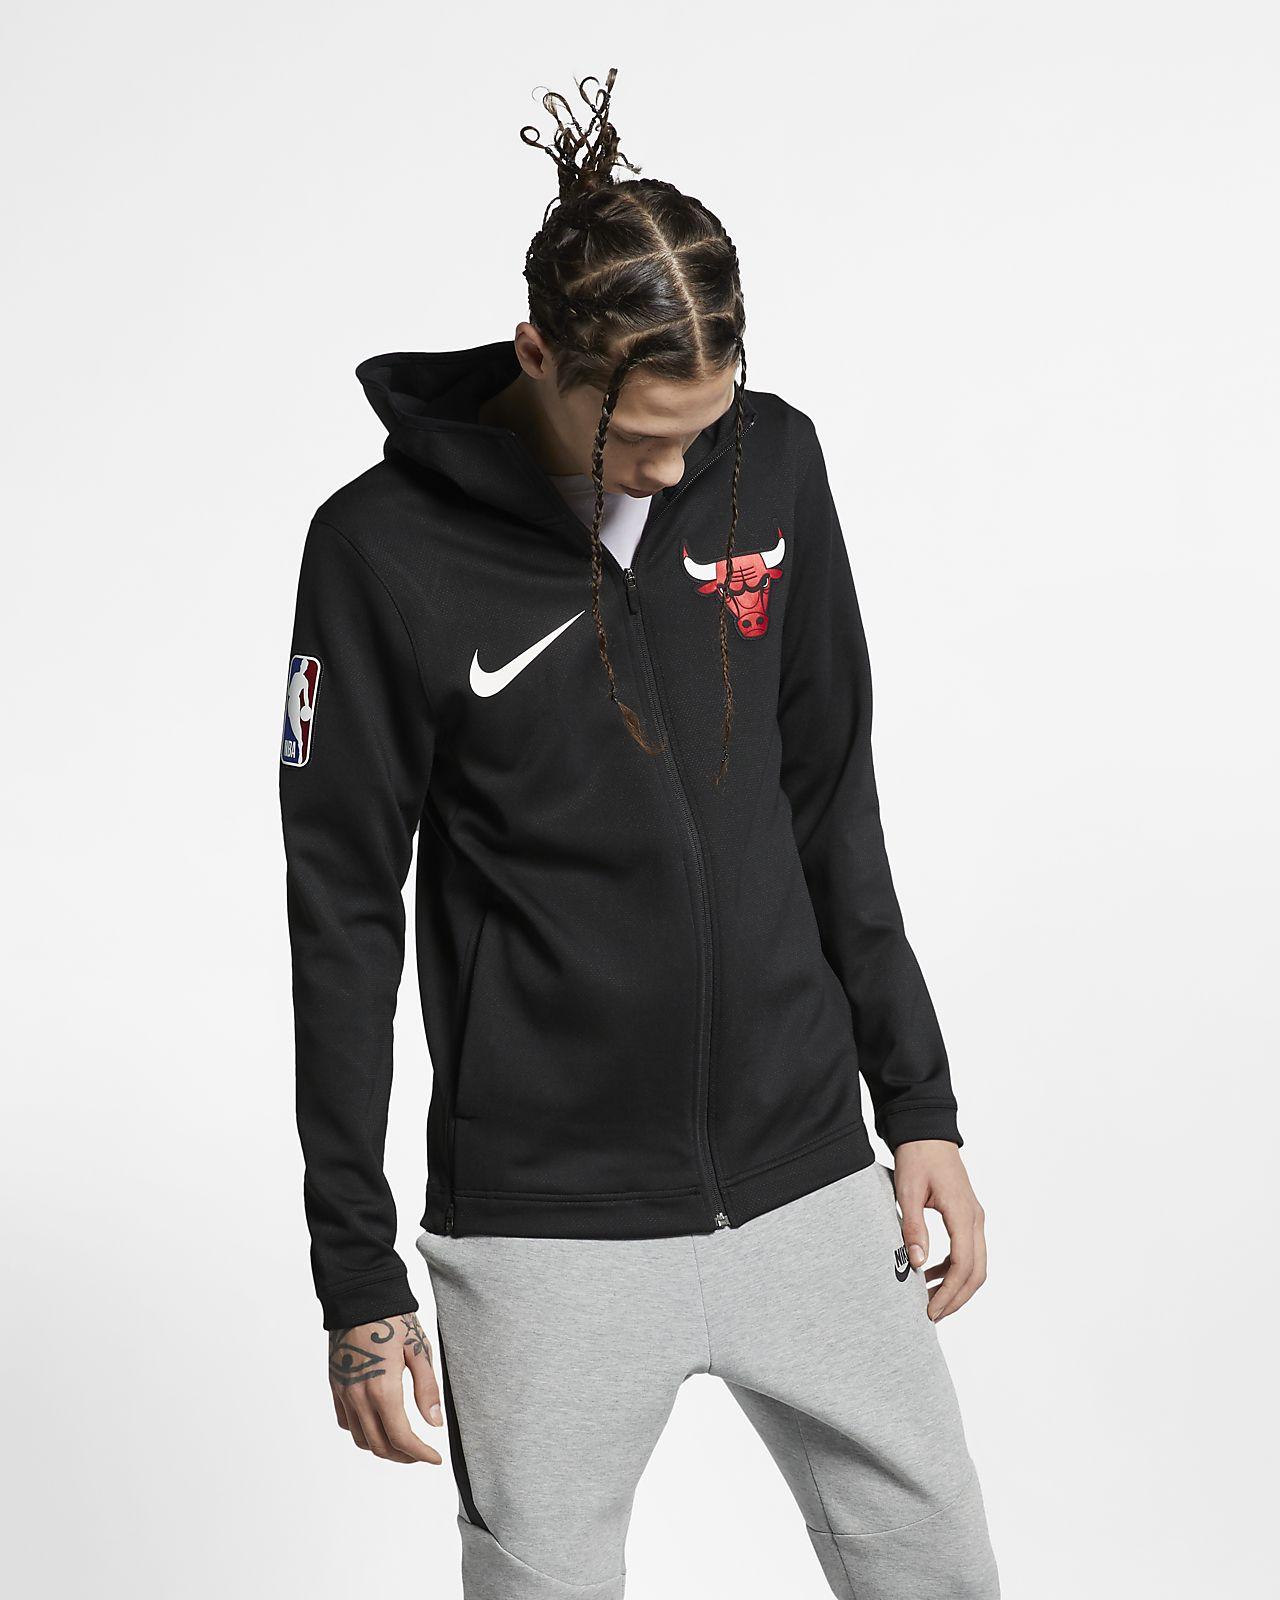 b7a334b345a28 ... Sudadera con capucha de NBA para hombre Chicago Bulls Nike Therma Flex  Showtime